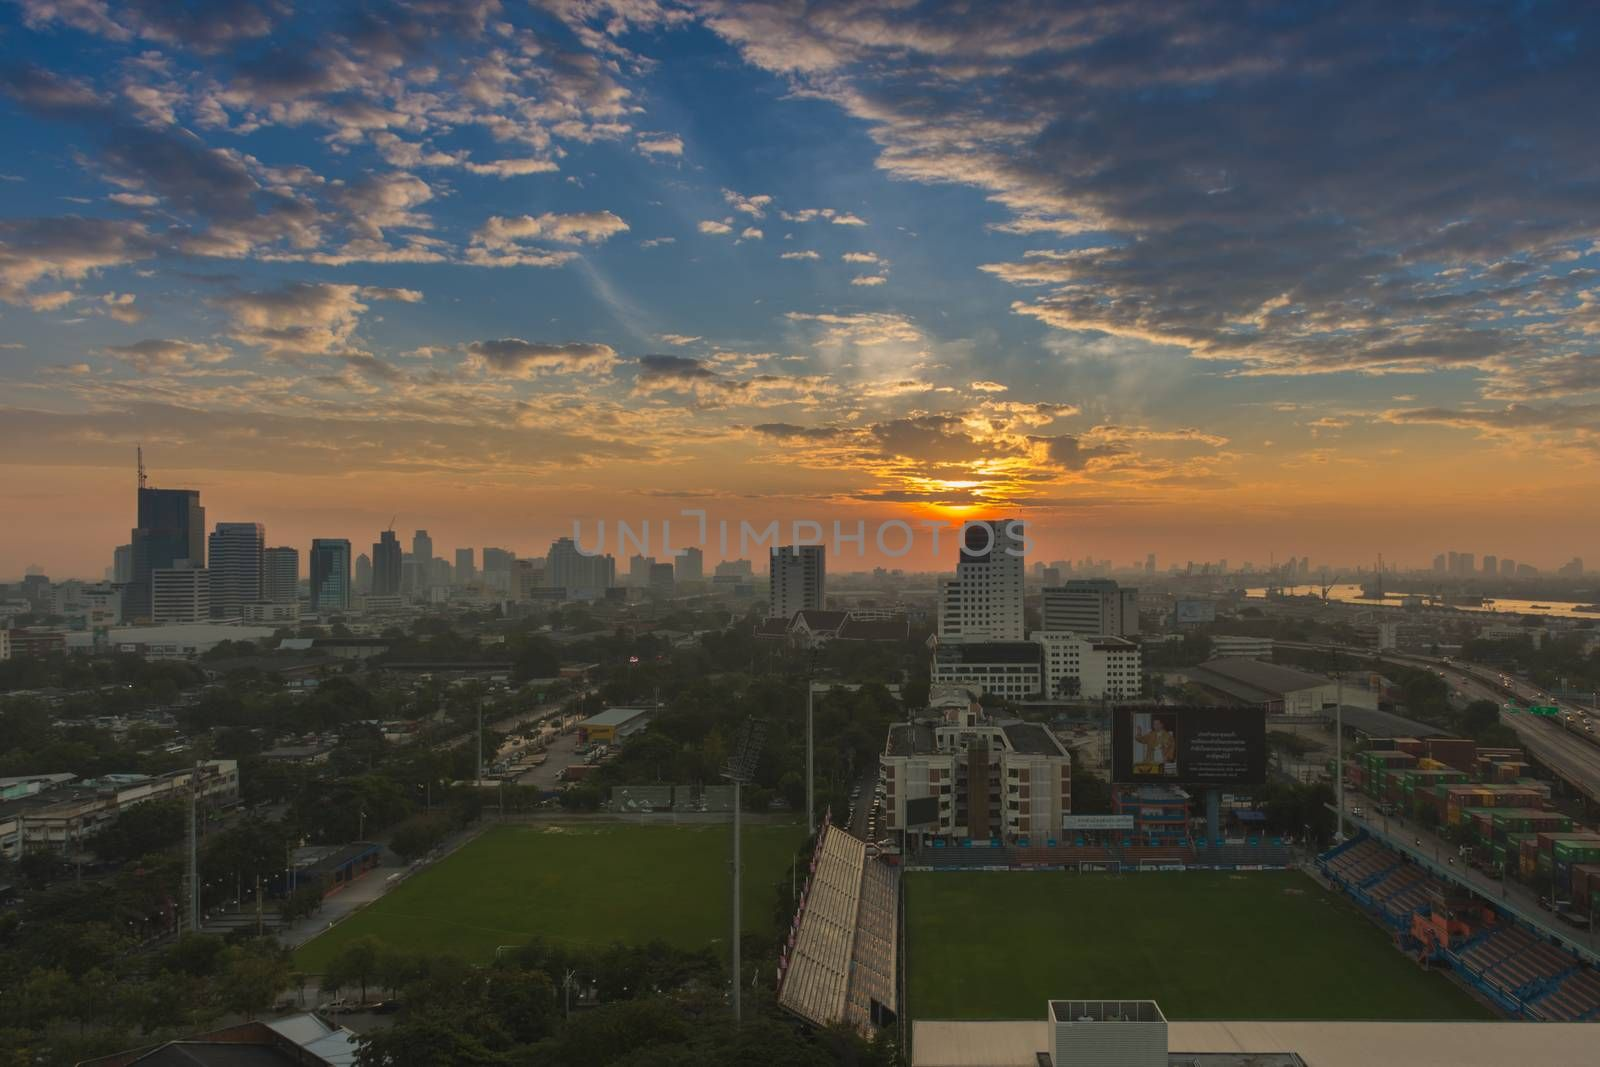 Bangkok, Thailand - December 30, 2016 : Sunshine morning time of Bangkok city with PAT Football stadium. Bangkok is the capital and the most populous city of Thailand.